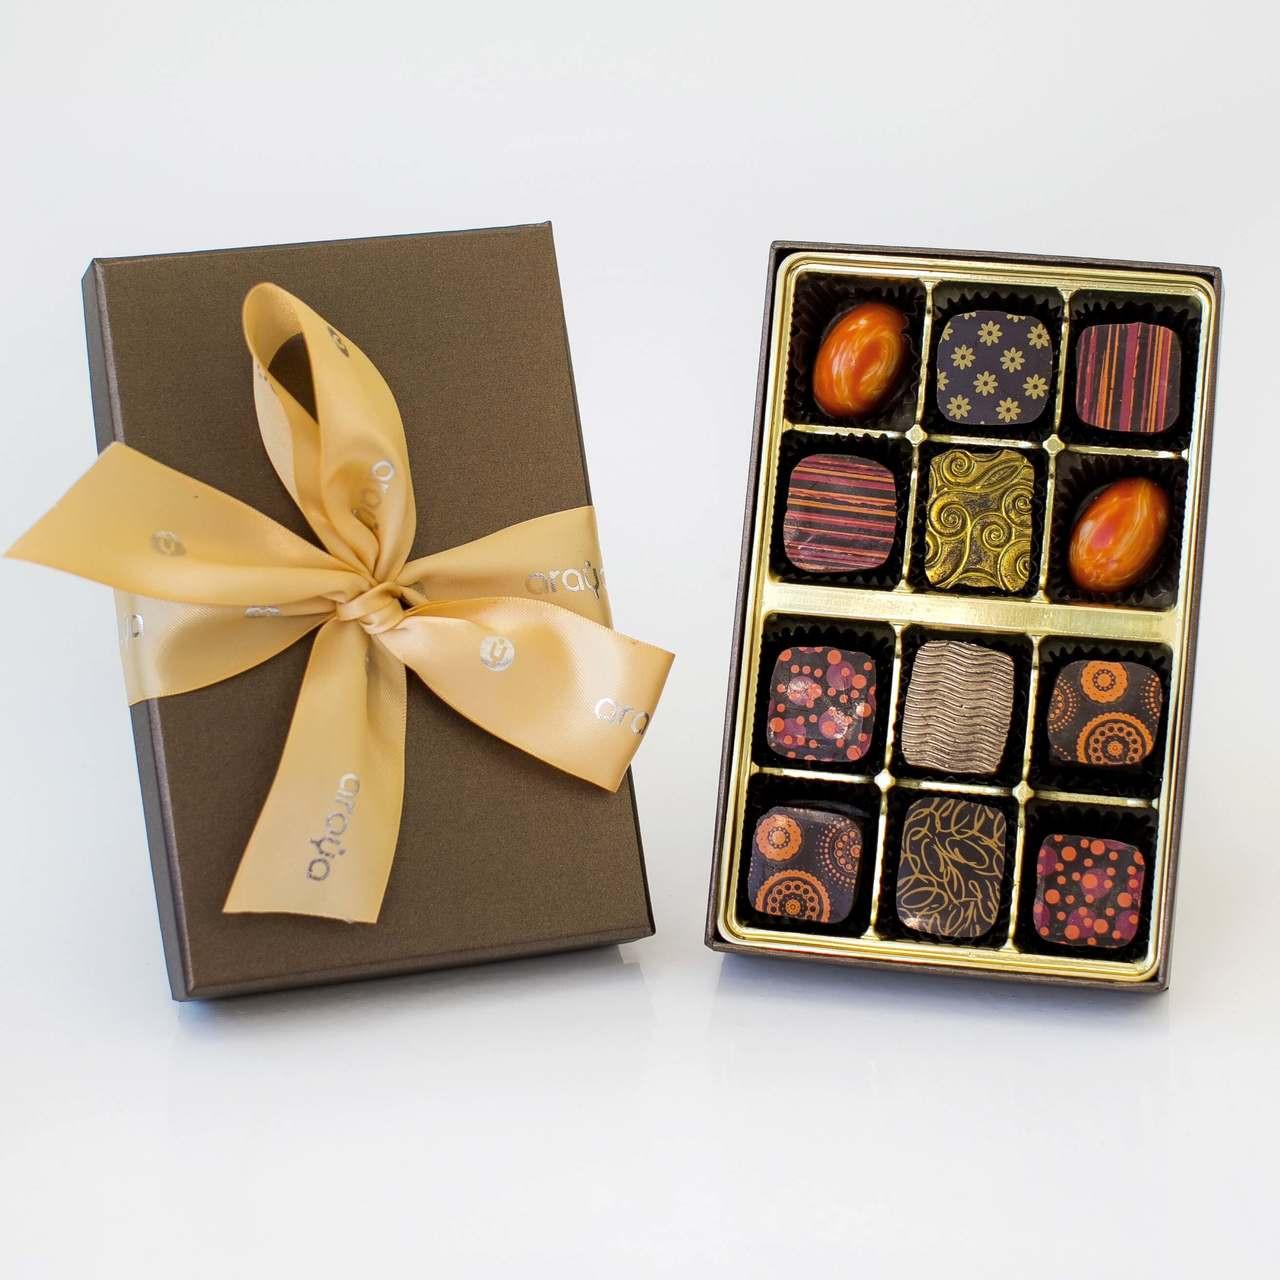 MILK CHOCOLATE  From$22-$75